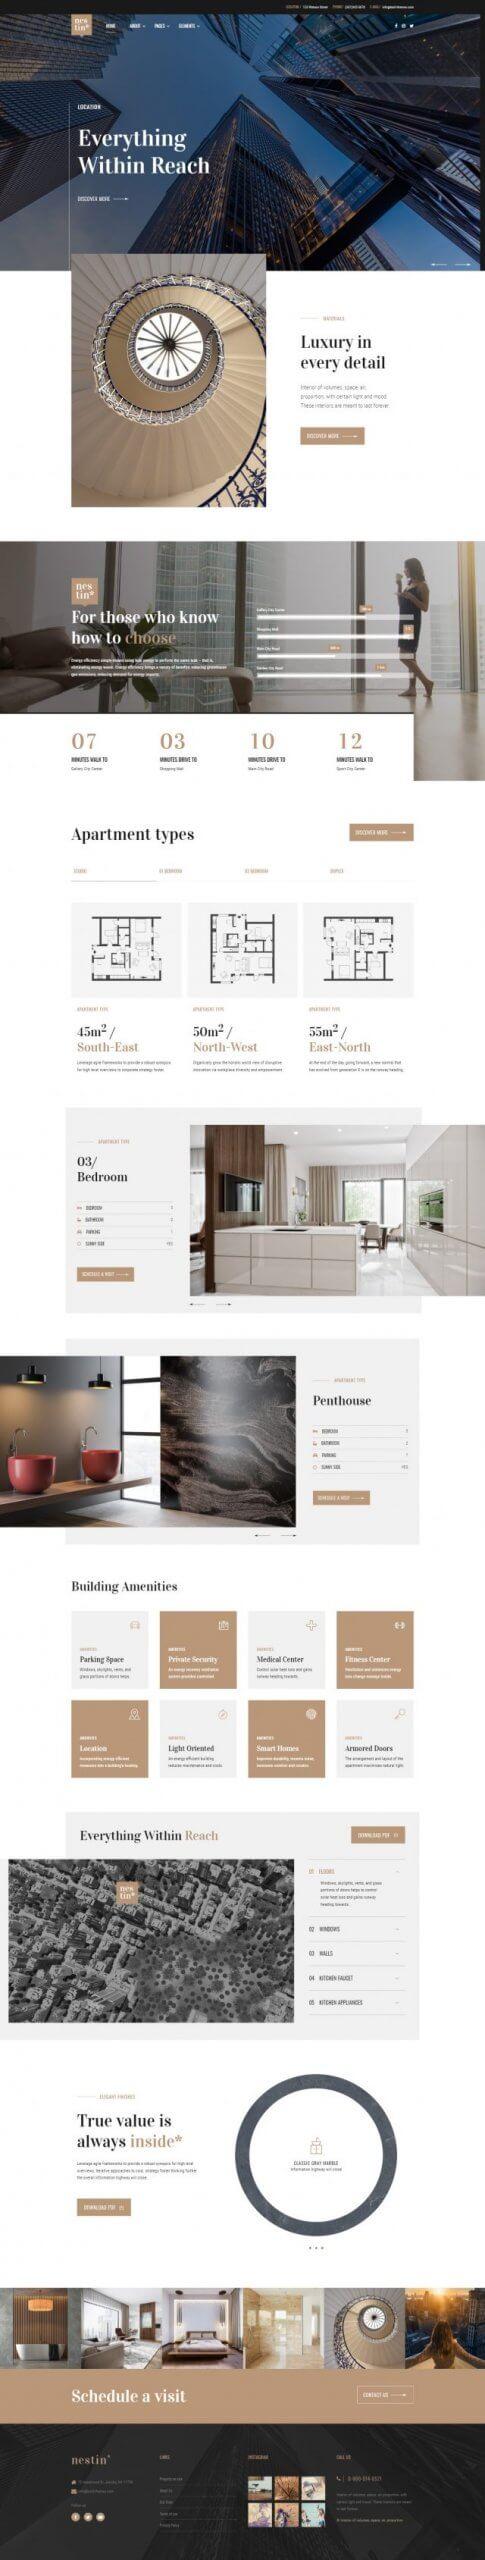 https://nestin.bold-themes.com/fancy/wp-content/uploads/sites/3/2020/03/Demo-02-scaled-1.jpg